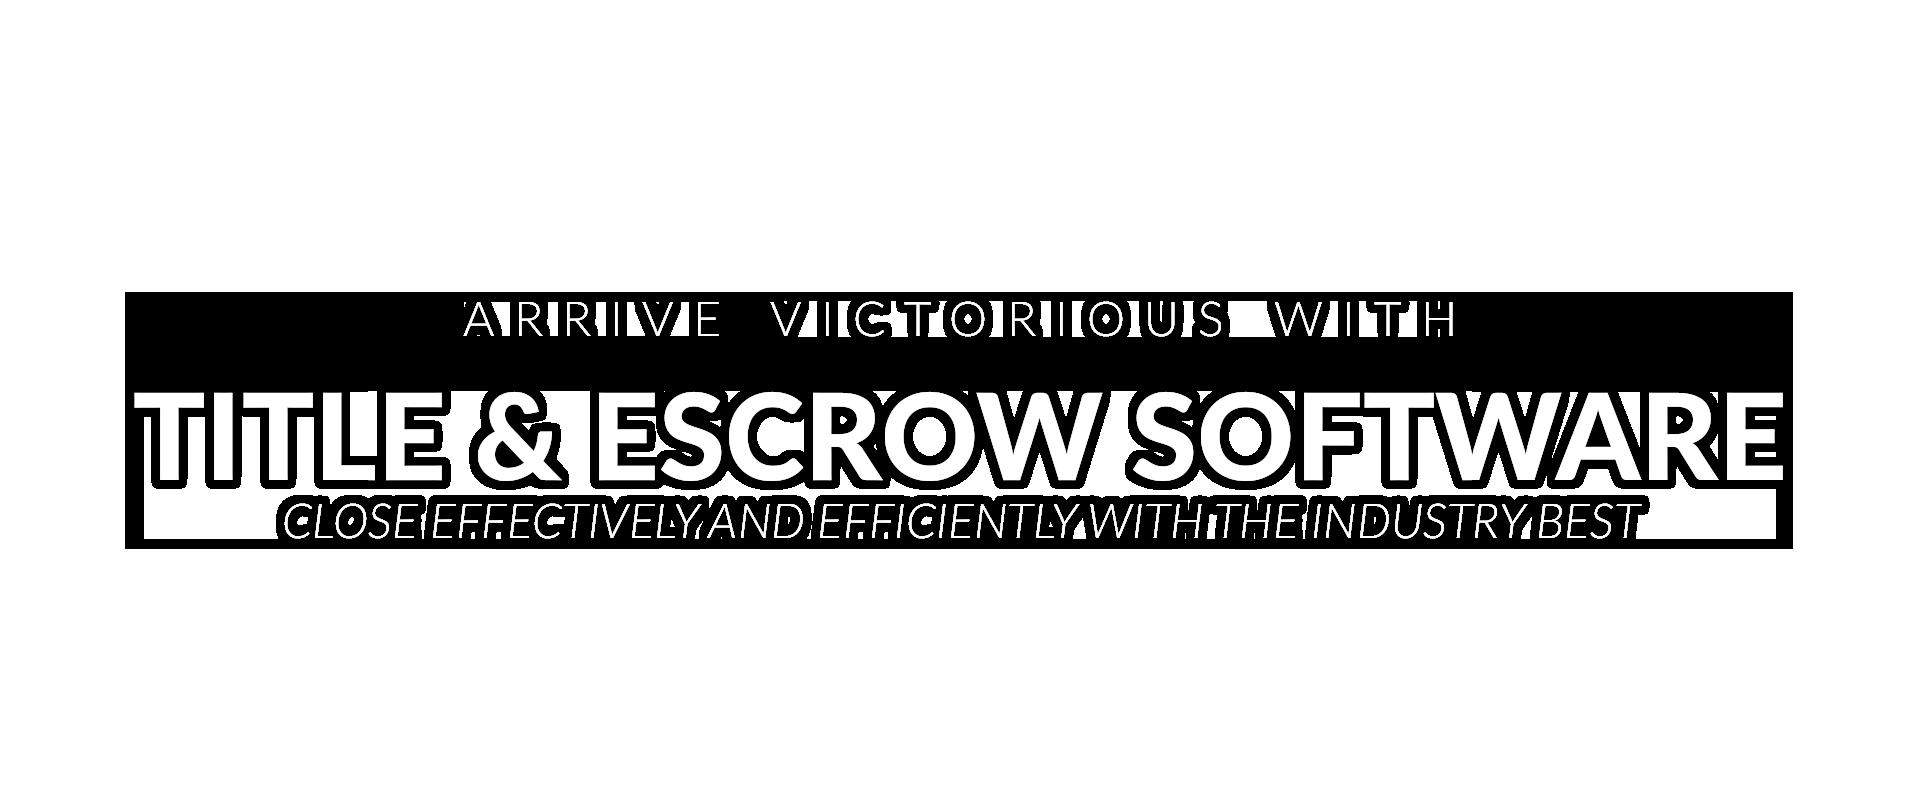 Title & Escrow Software